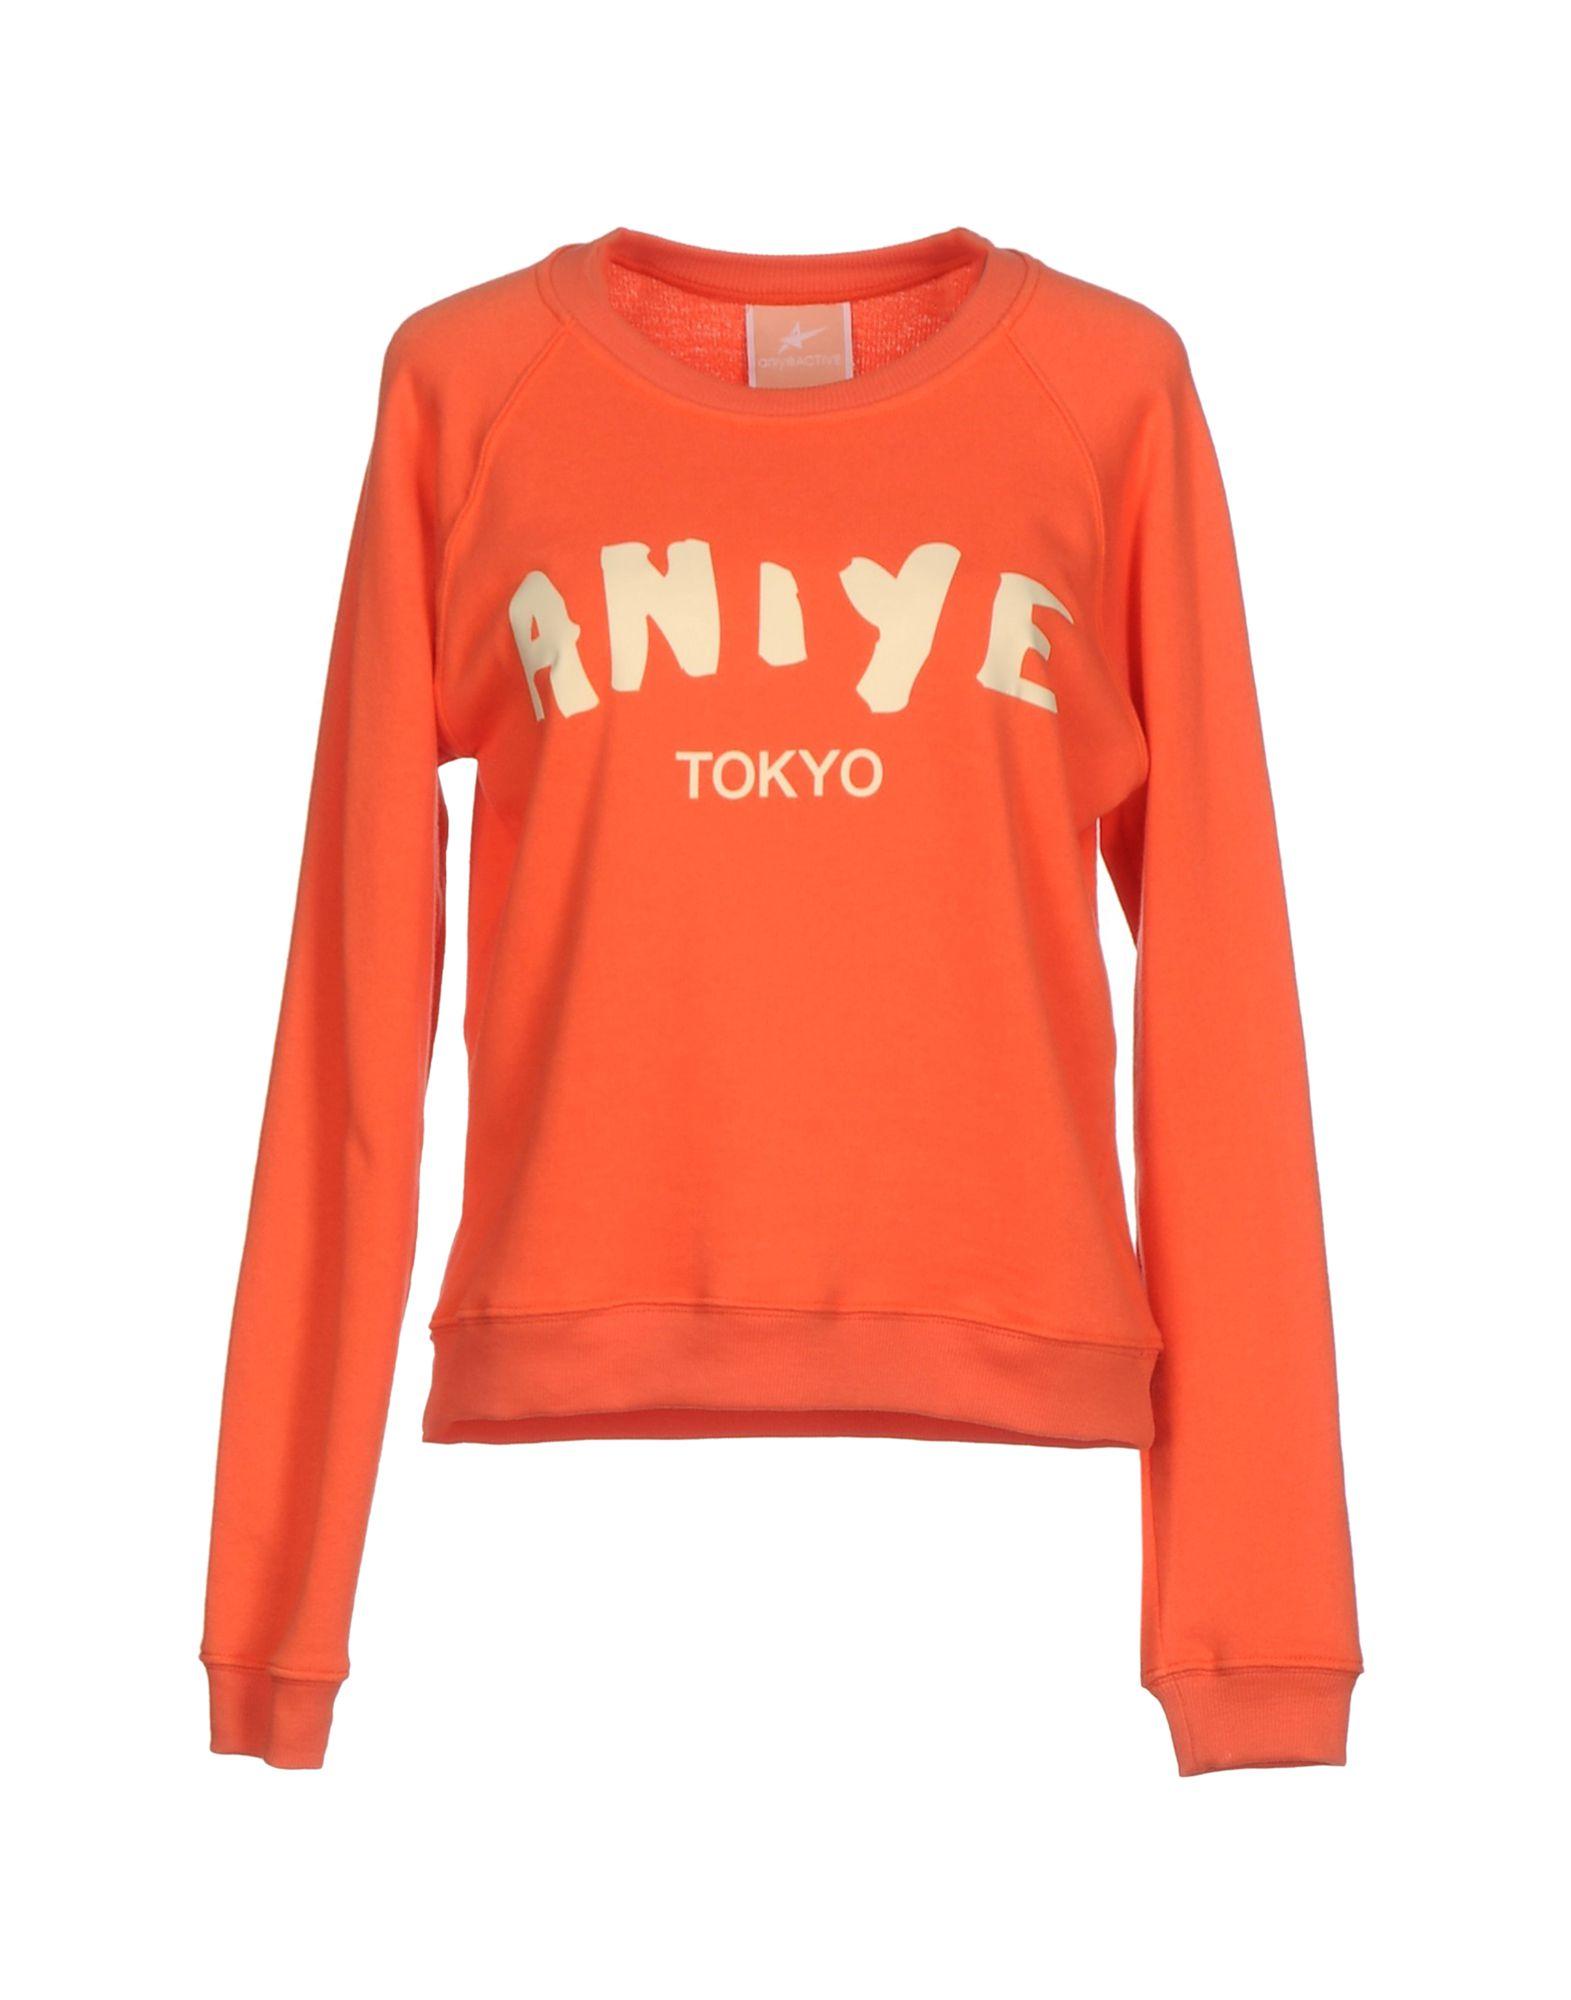 ANIYE BY Damen Sweatshirt Farbe Rot Größe 6